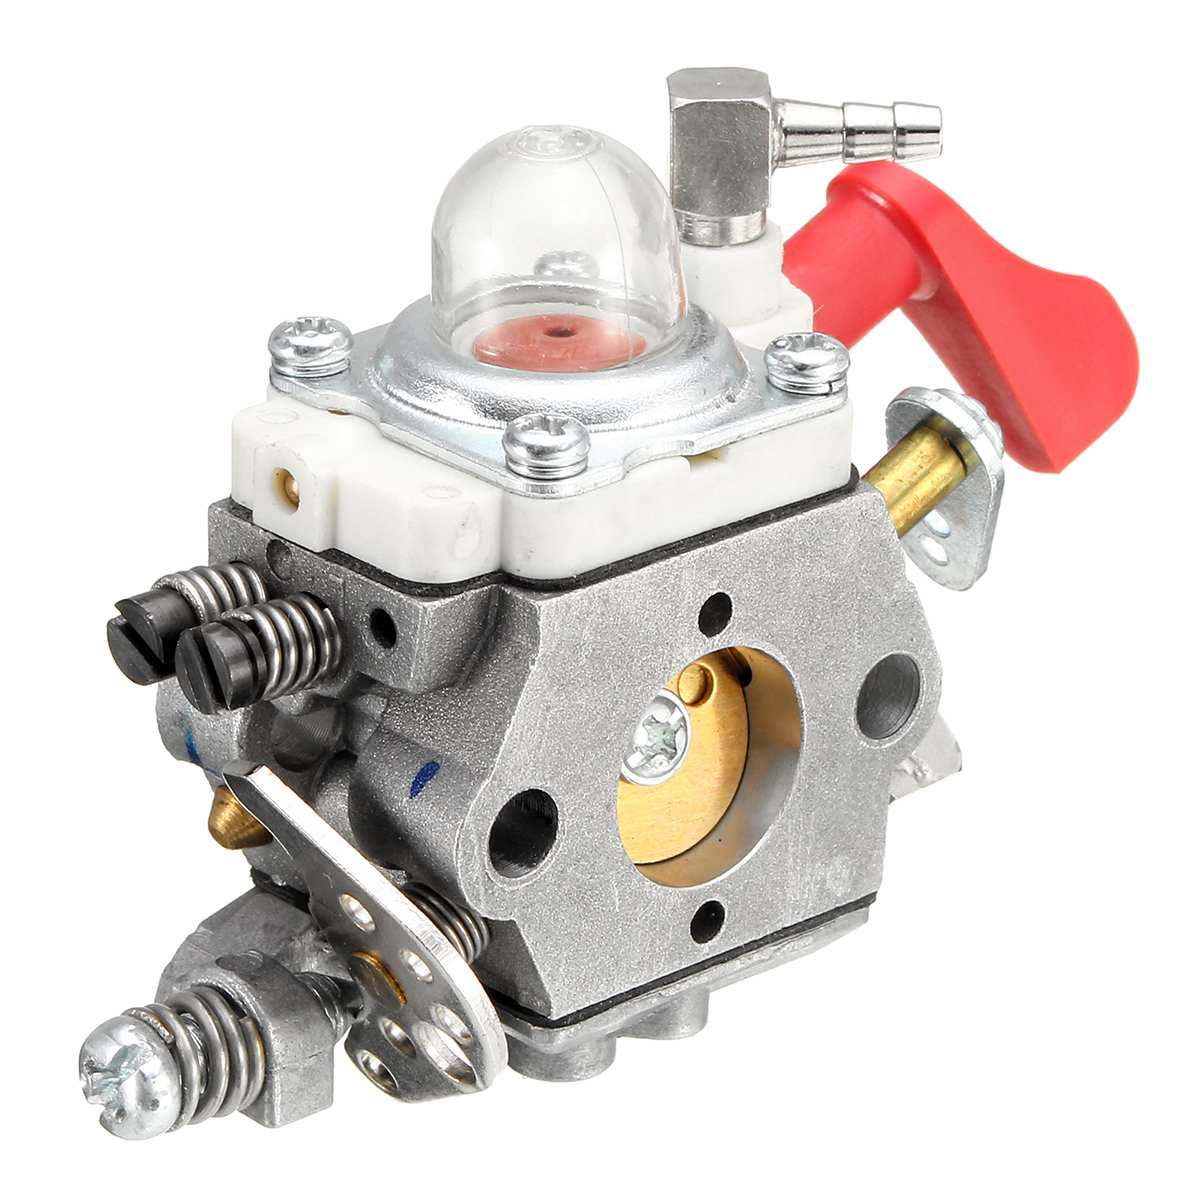 Carburetor Replace for Walbro WT 668 997 HPI Baja 5B FG ZENOAH CY RCMK Losi CarCarburetor Replace for Walbro WT 668 997 HPI Baja 5B FG ZENOAH CY RCMK Losi Car